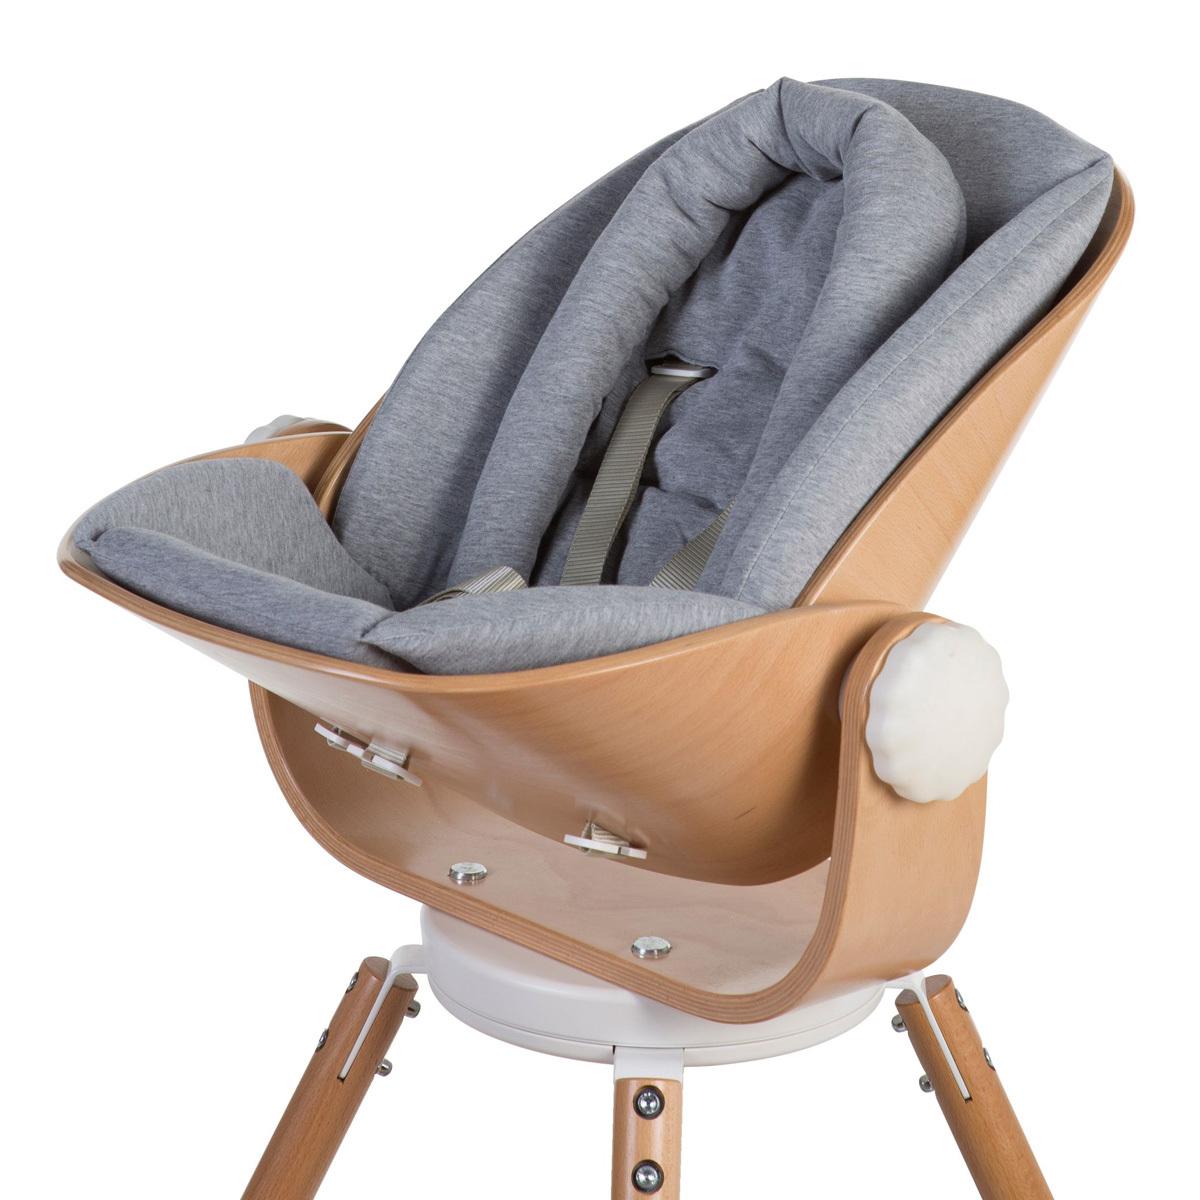 Chaise haute Coussin Evolu Newborn Jersey - Gris Coussin pour Siège Evolu Newborn Jersey - Gris